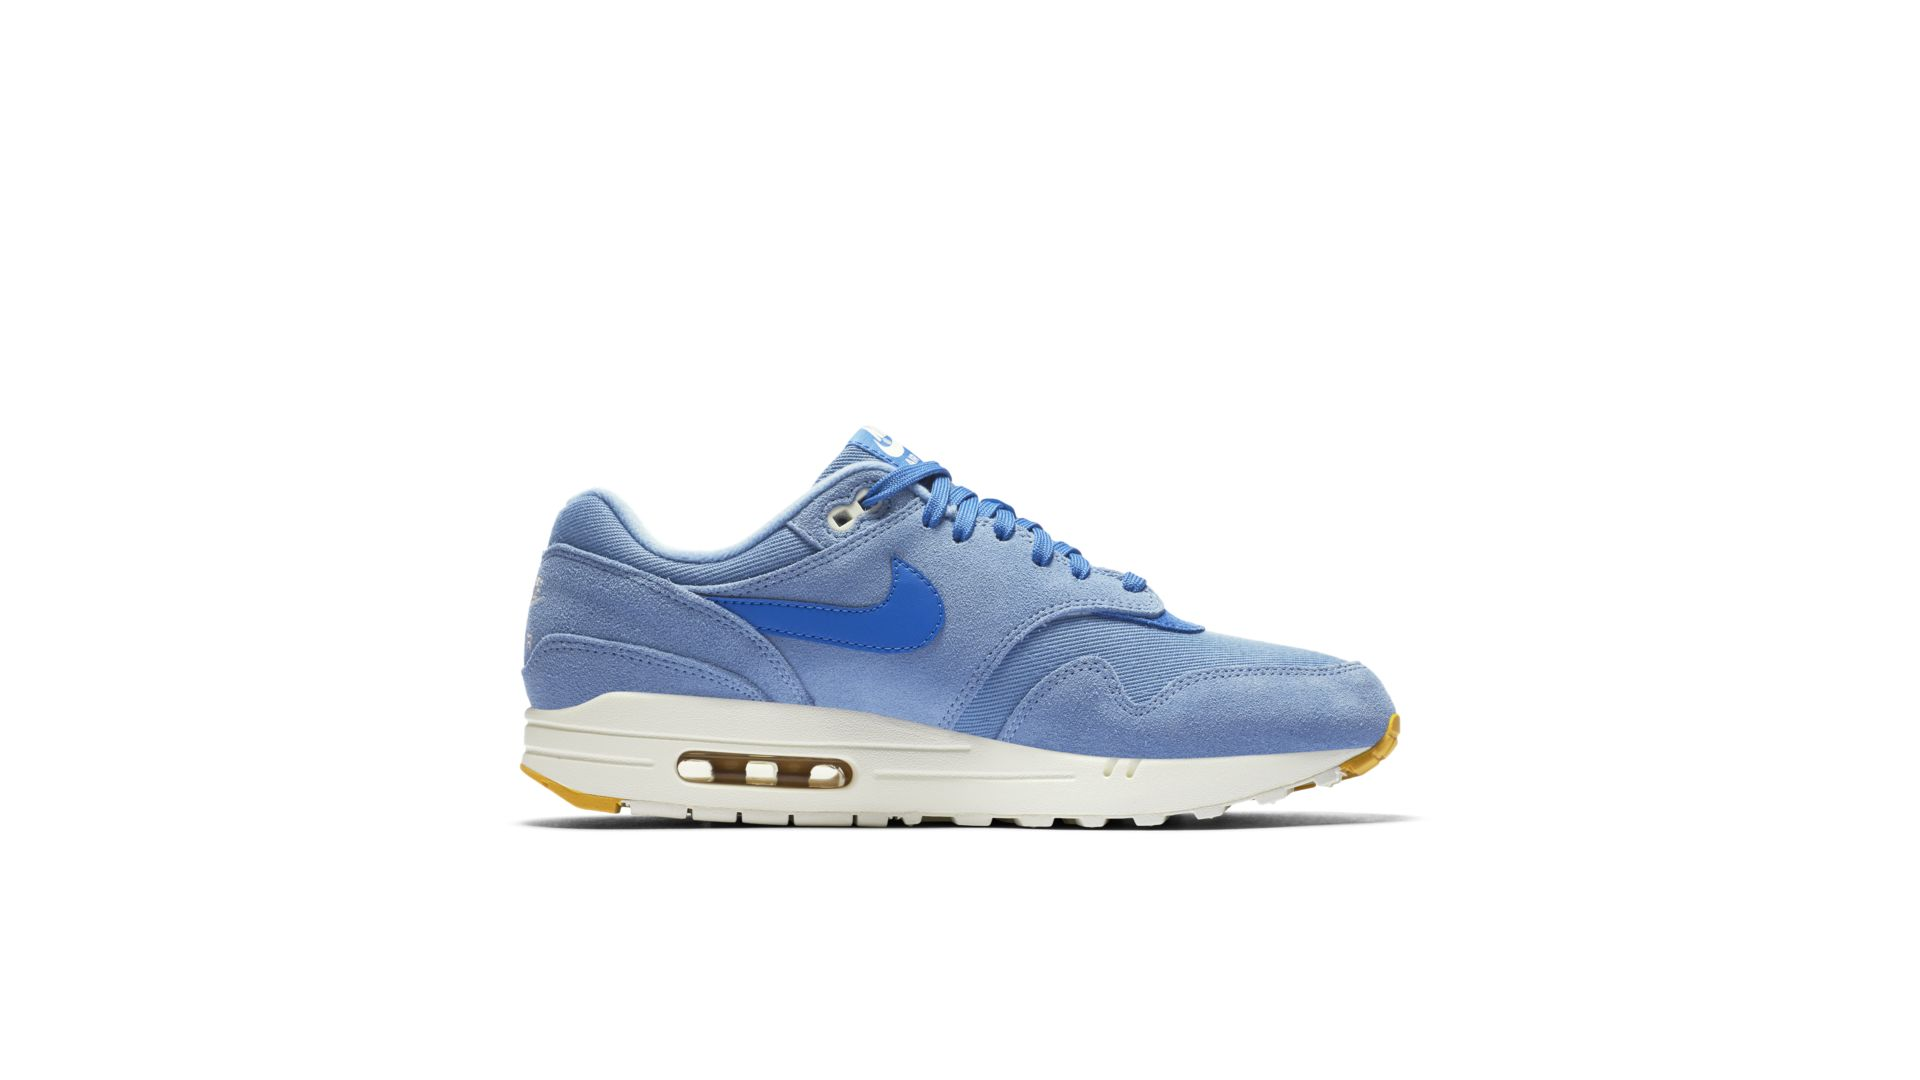 Nike Air Max 1 Premium Work Blue 875844 404 Release Date SBD